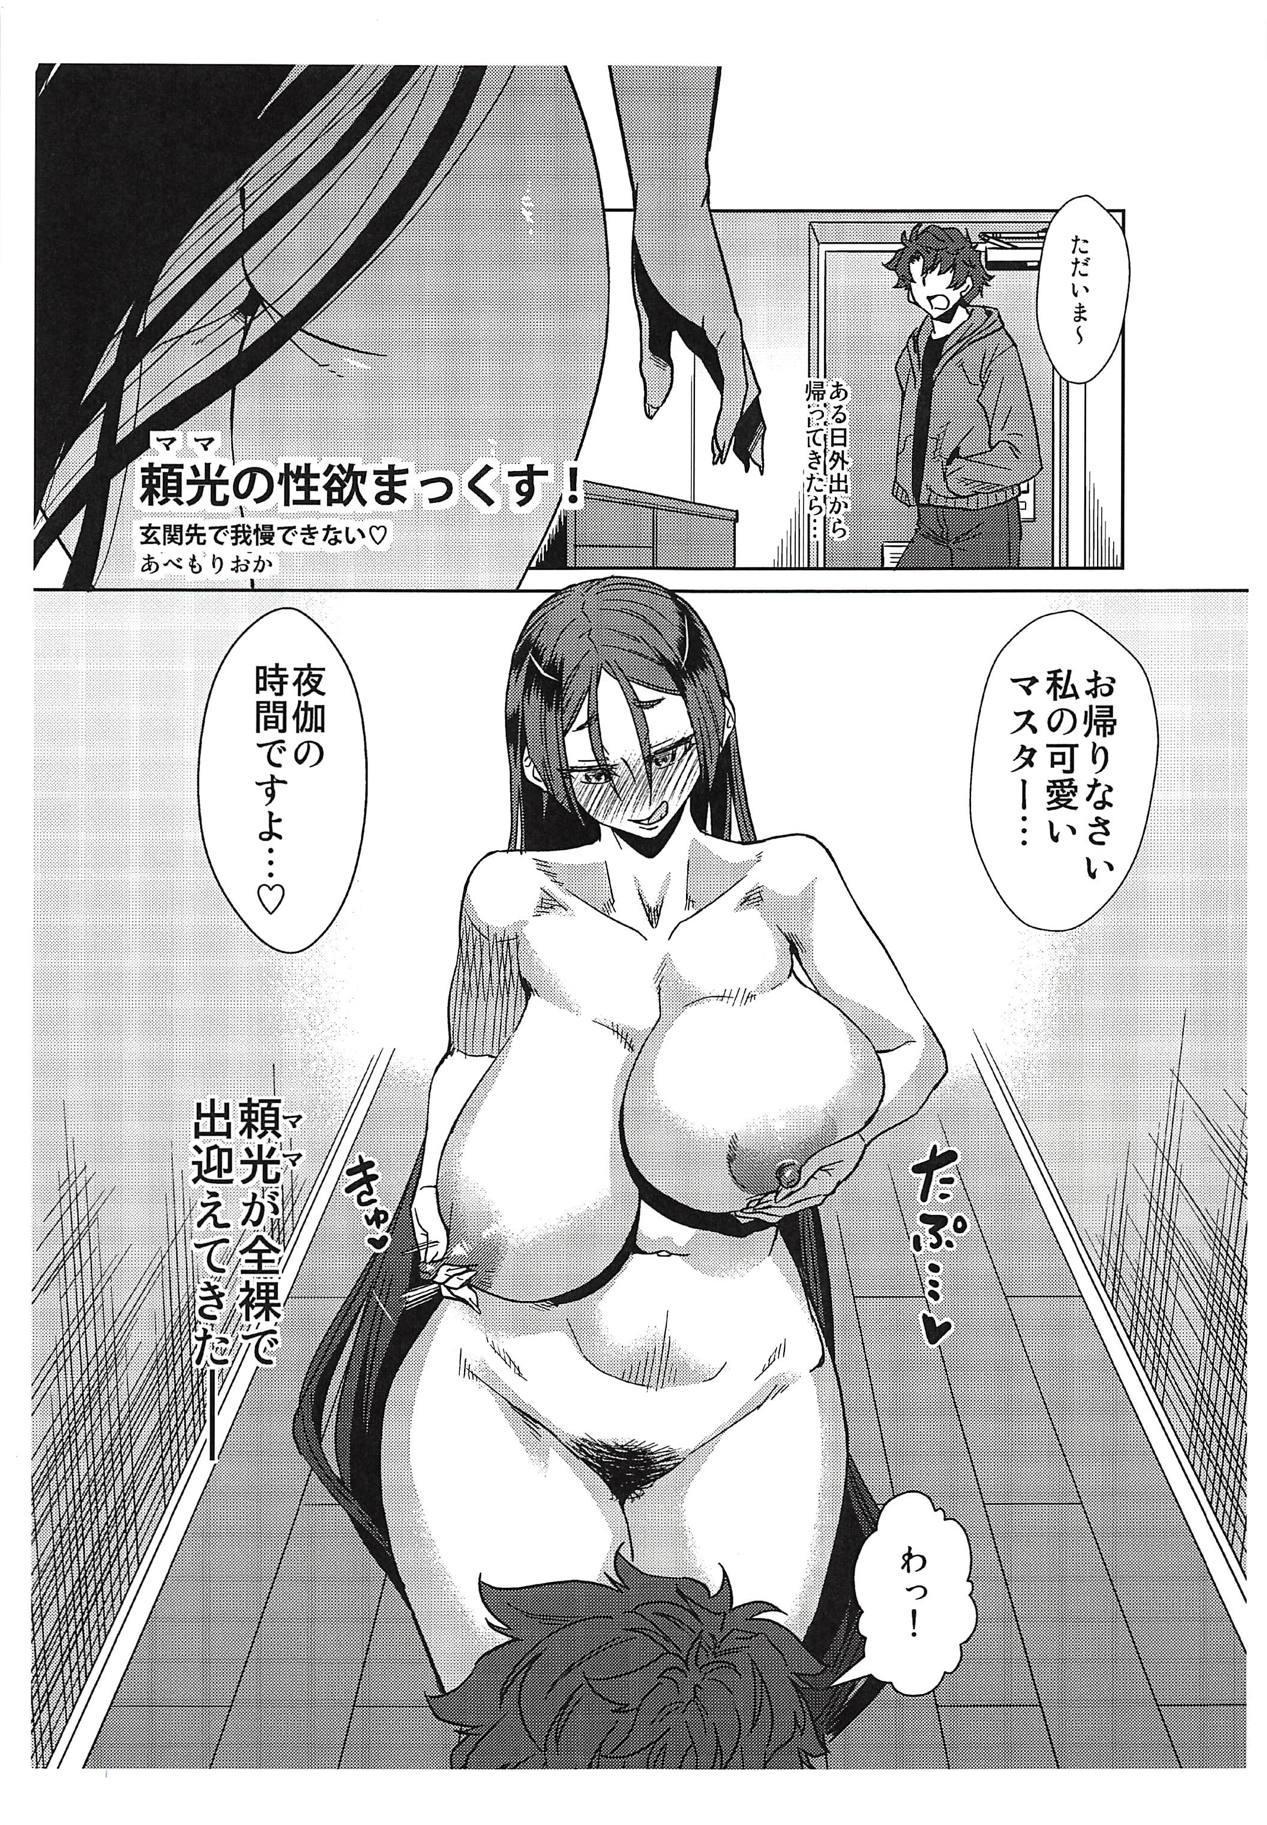 Icha Love Servant 5